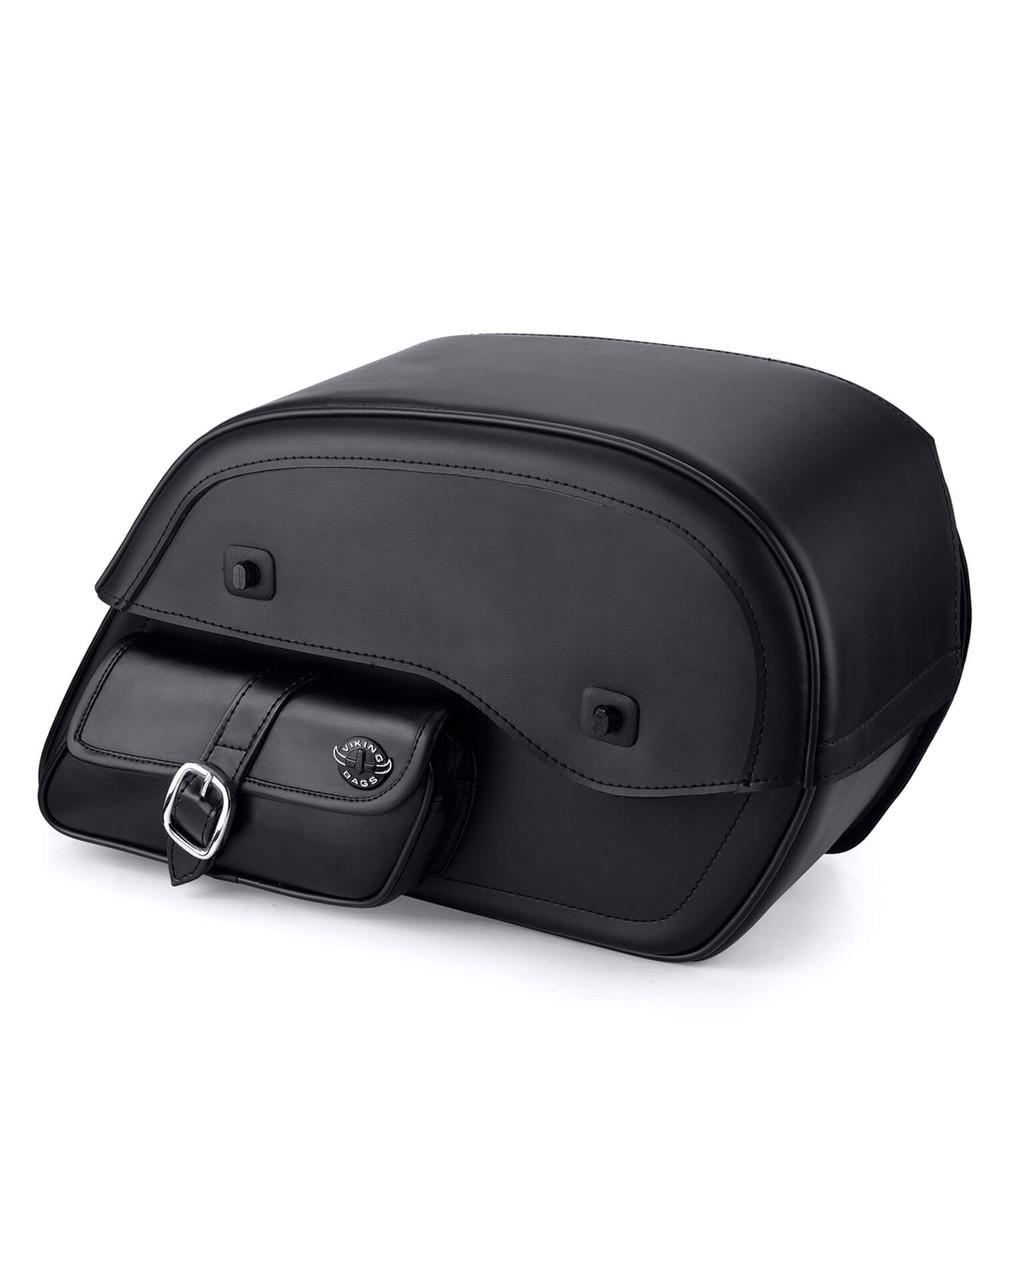 Viking SS Side Pocket Large Motorcycle Saddlebags For Harley Softail Custom FXSTC Main bag View